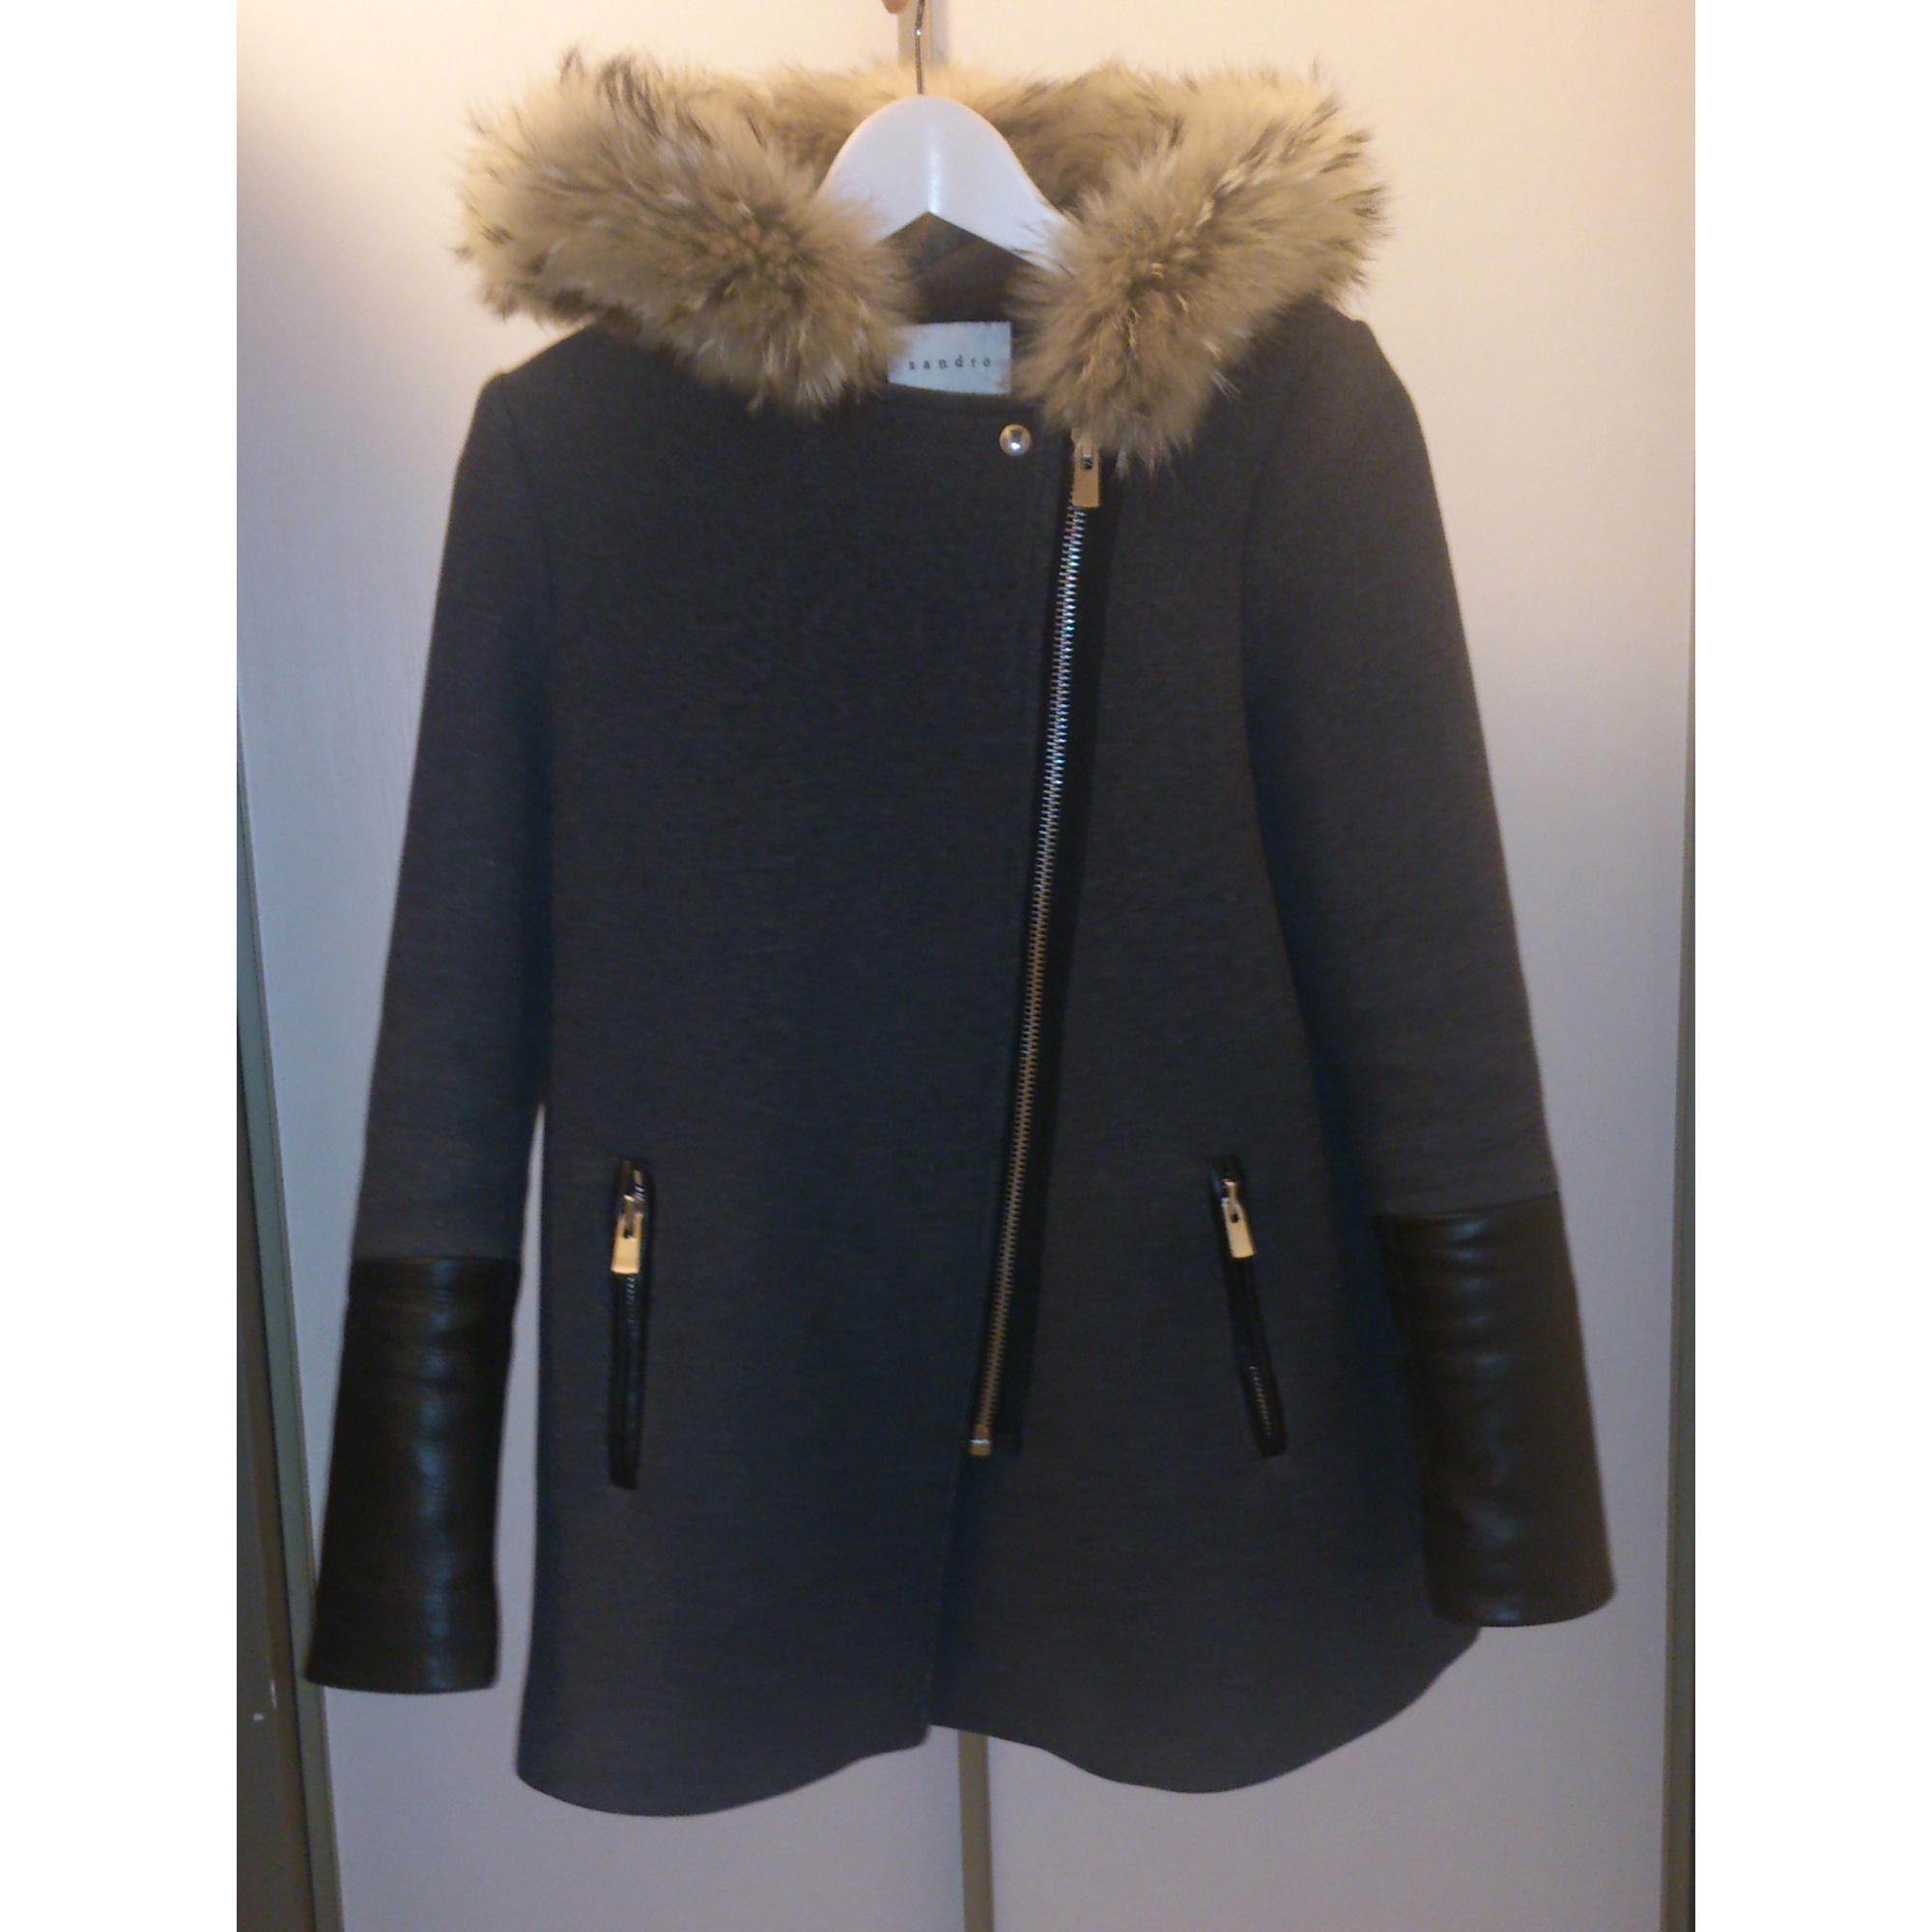 s Code Sandro Grau Mantel Dress Par Vendu T1 2461523 36 Mon Ea1wHqz